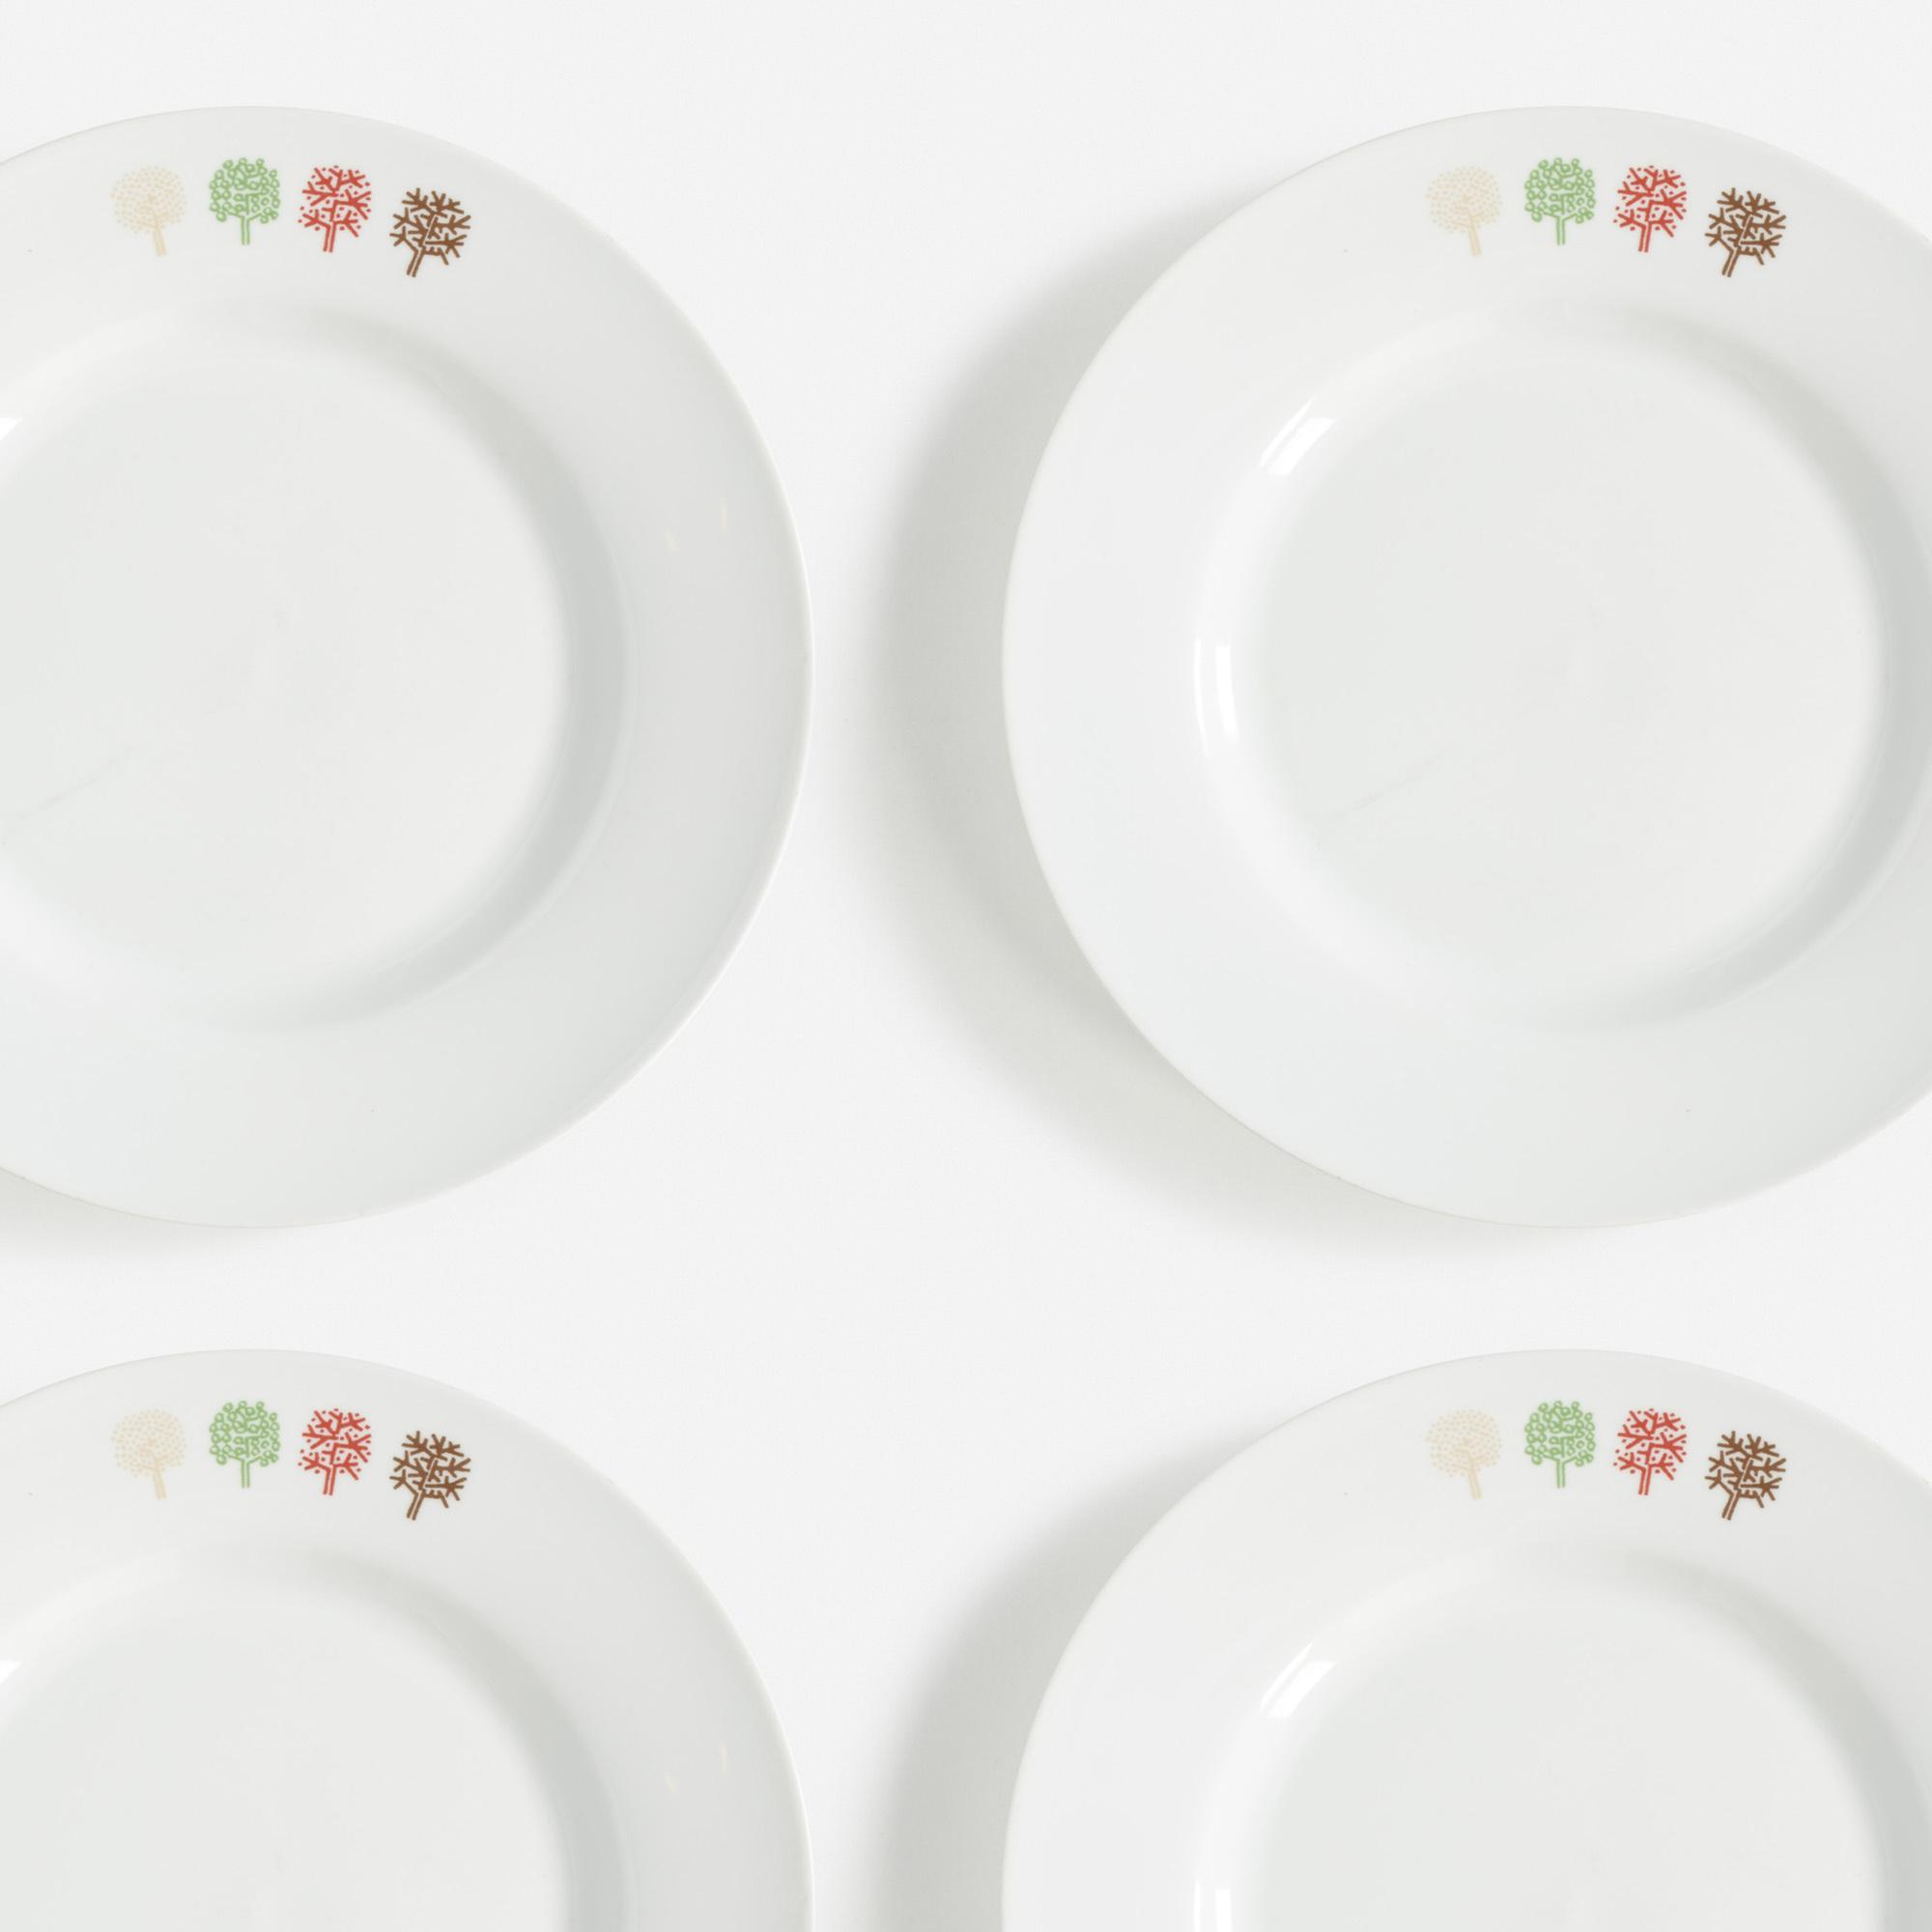 735:  / Four Seasons plates, set of twelve (1 of 1)